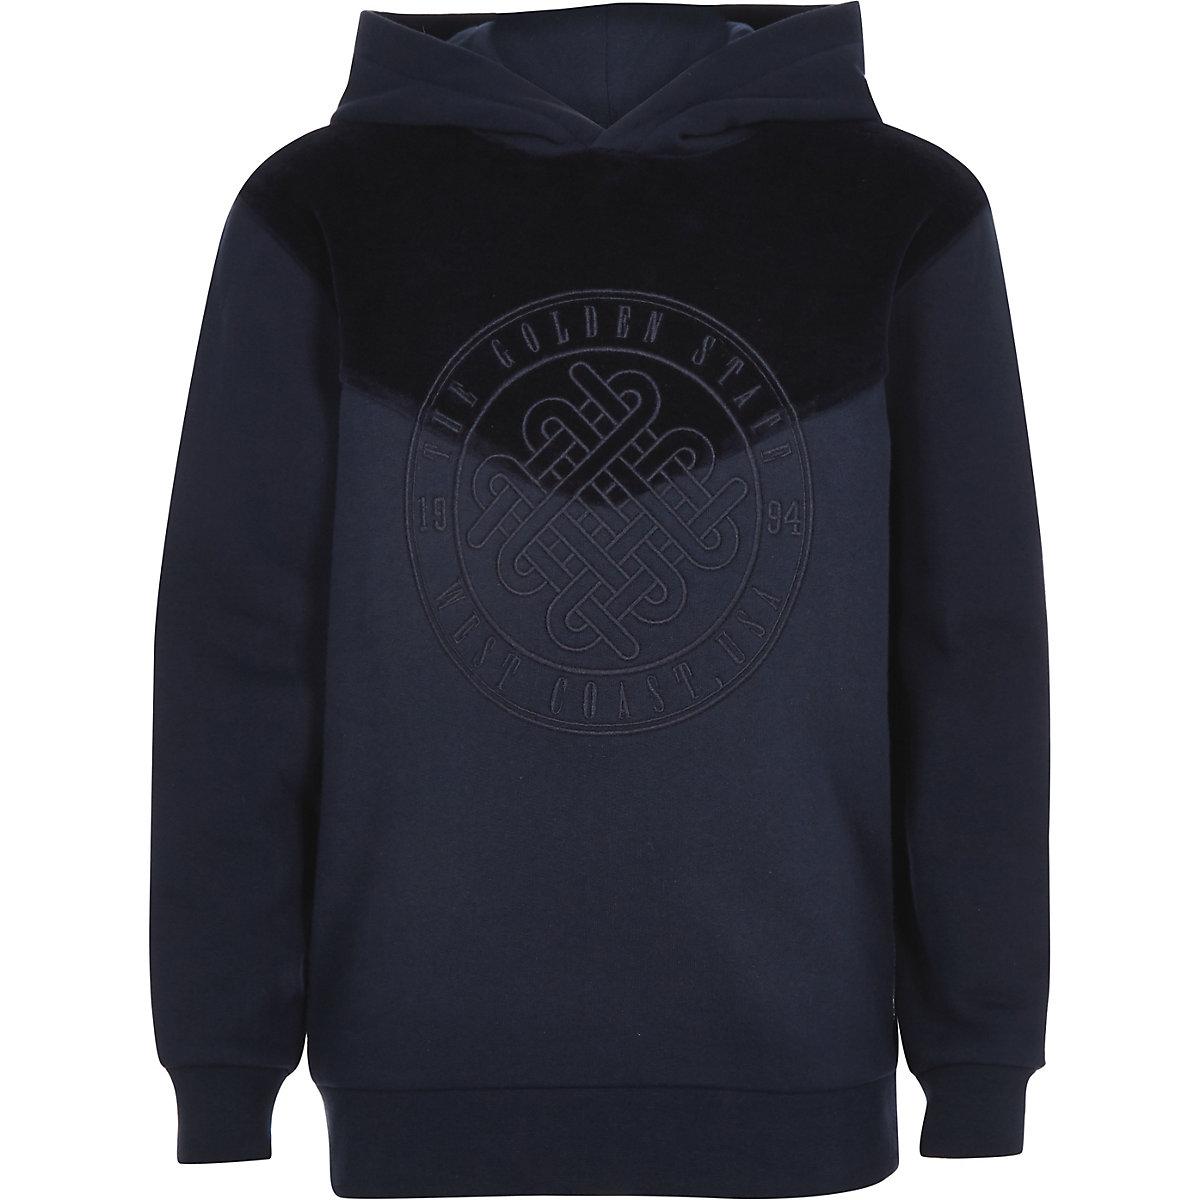 Boys navy 'Golden state' velour hoodie